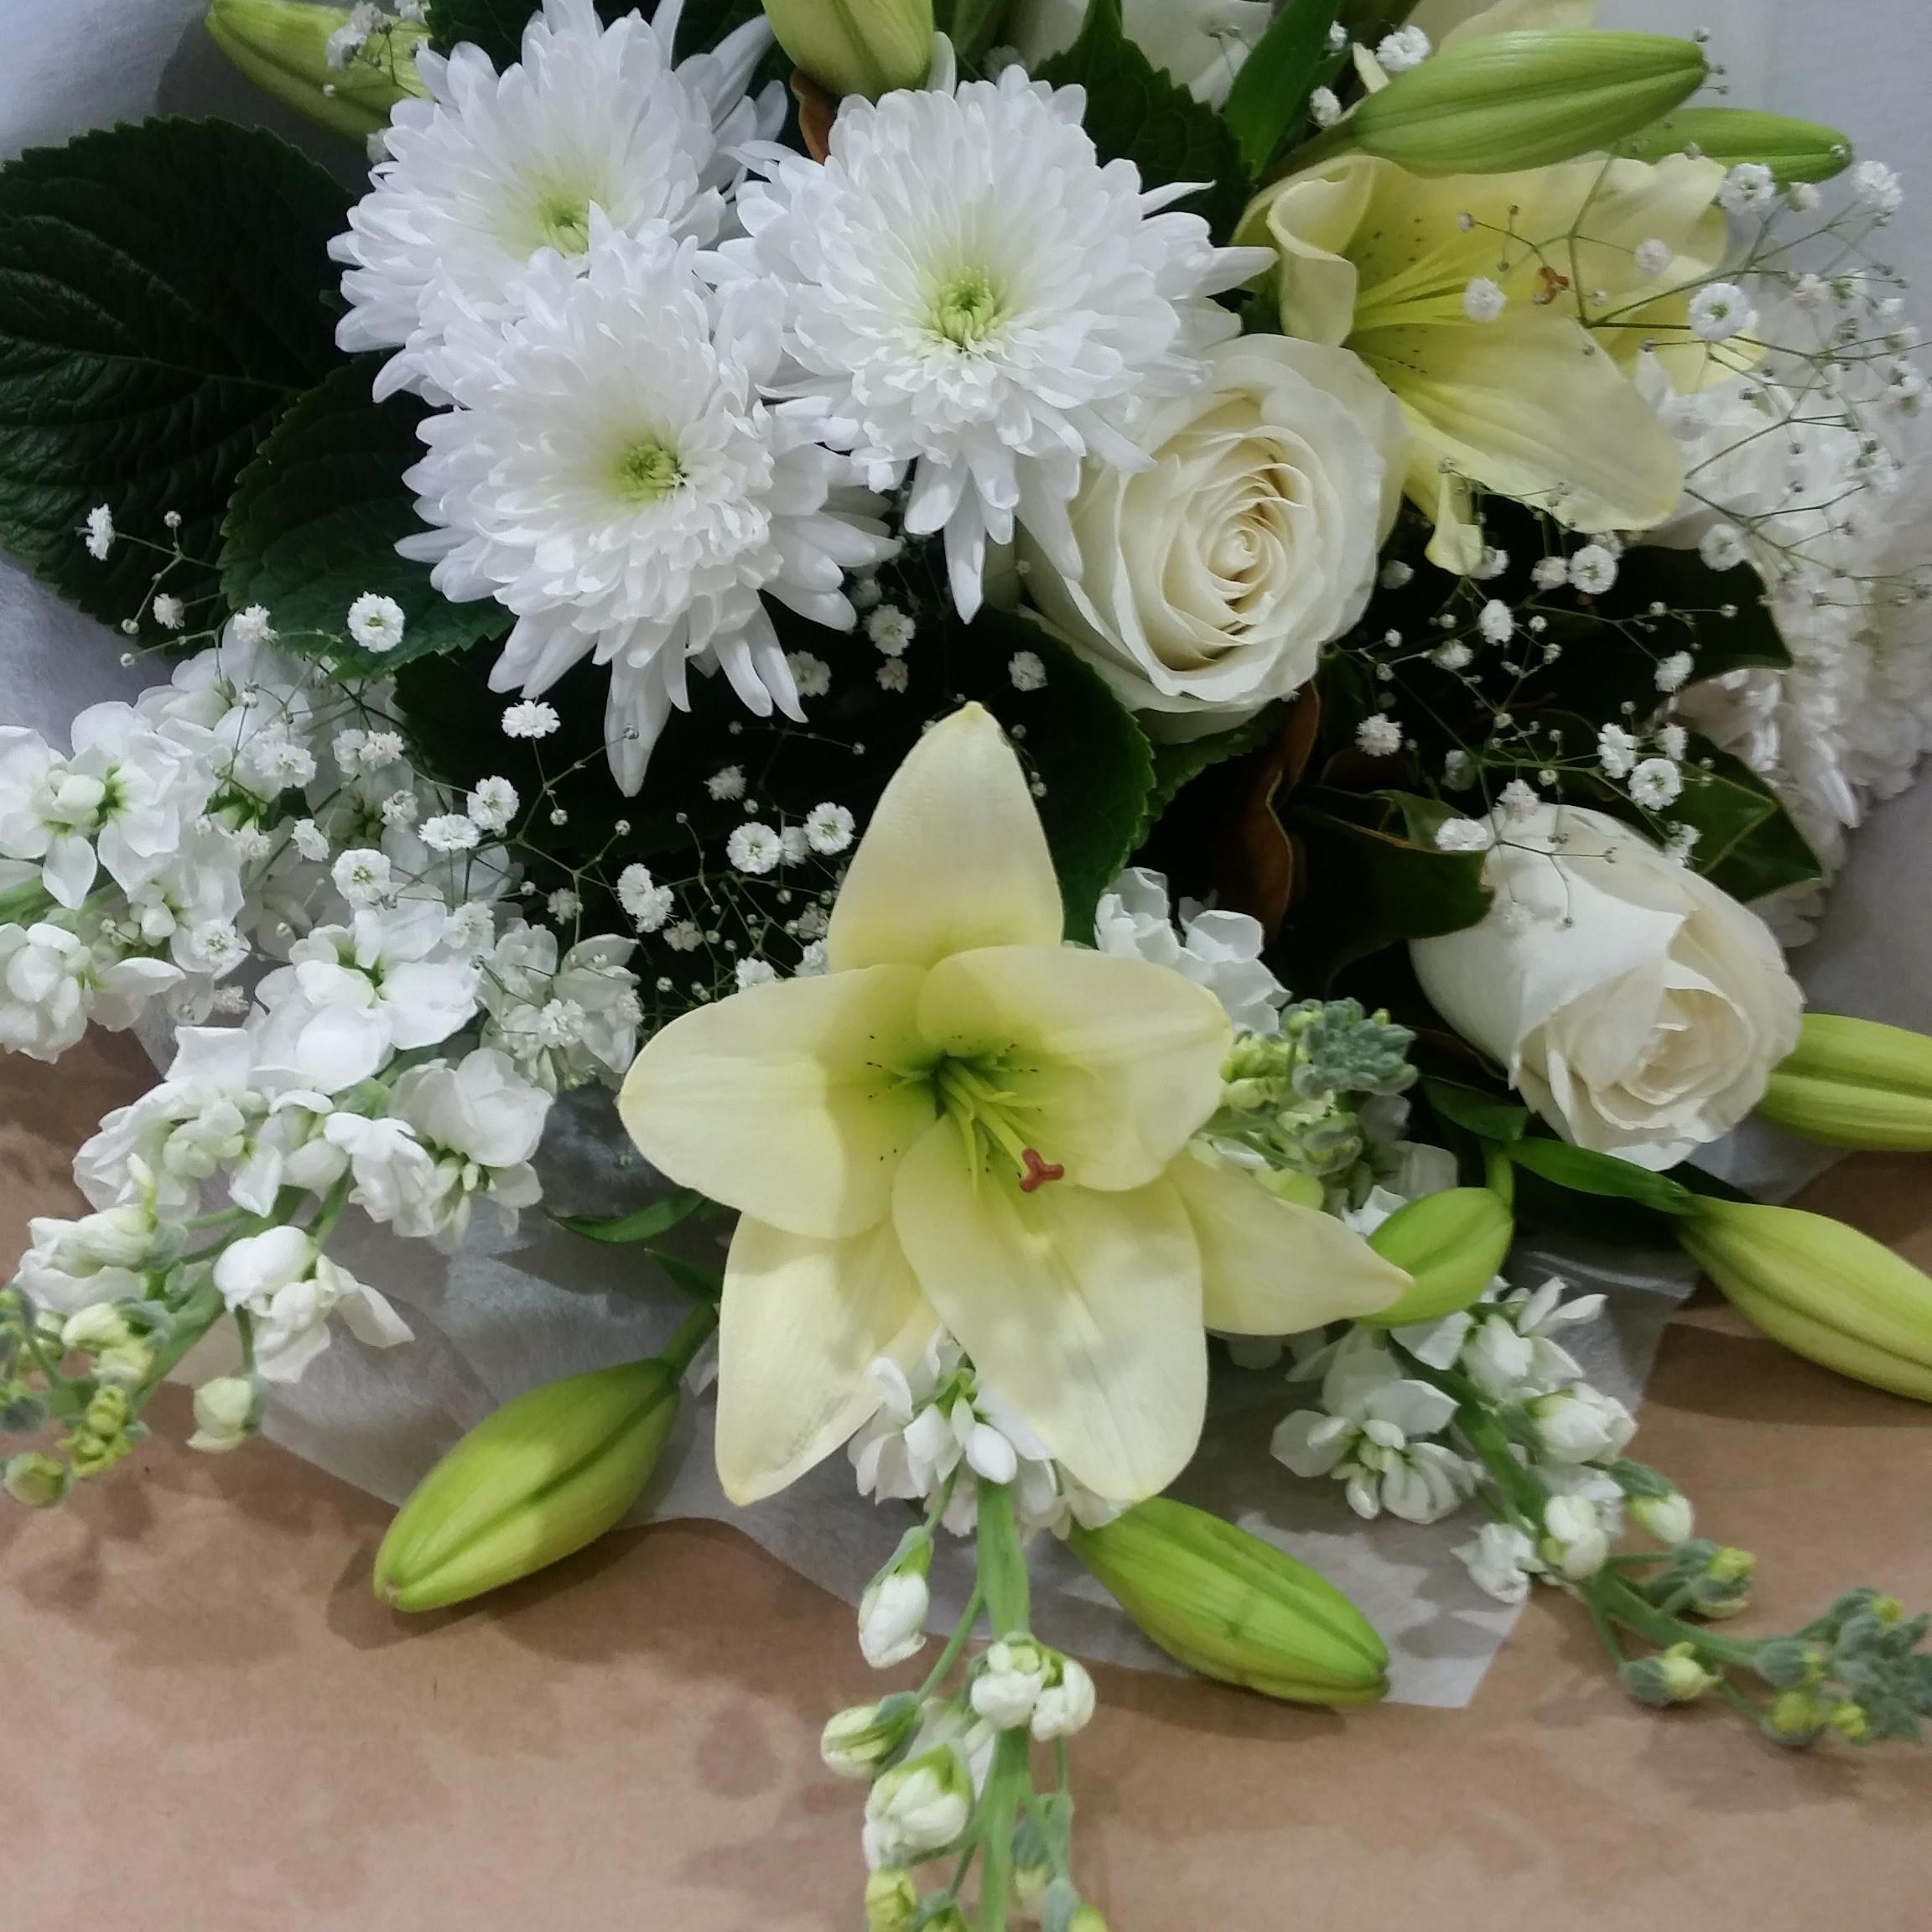 White And Green Bouquet Myrrh Co Florist Mt Maunganui